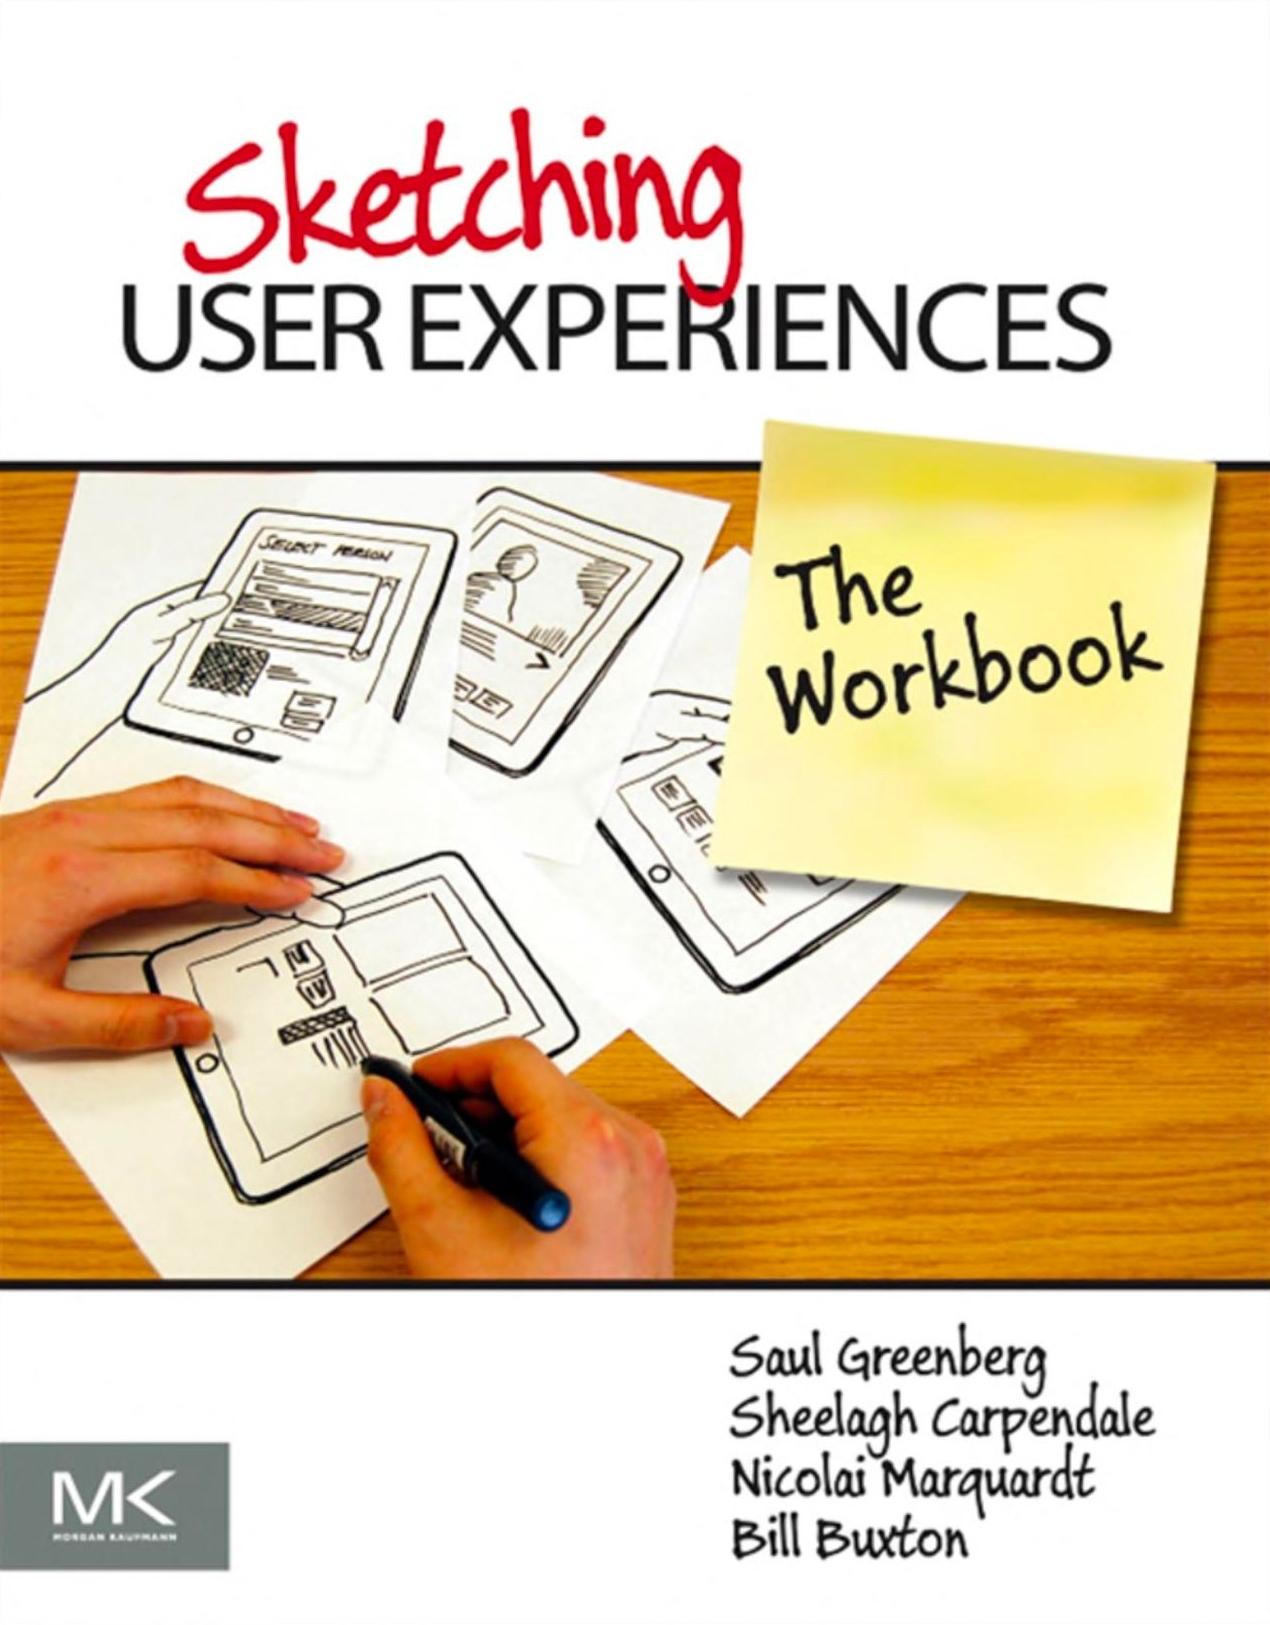 Sketching User Experiences - the Workbook